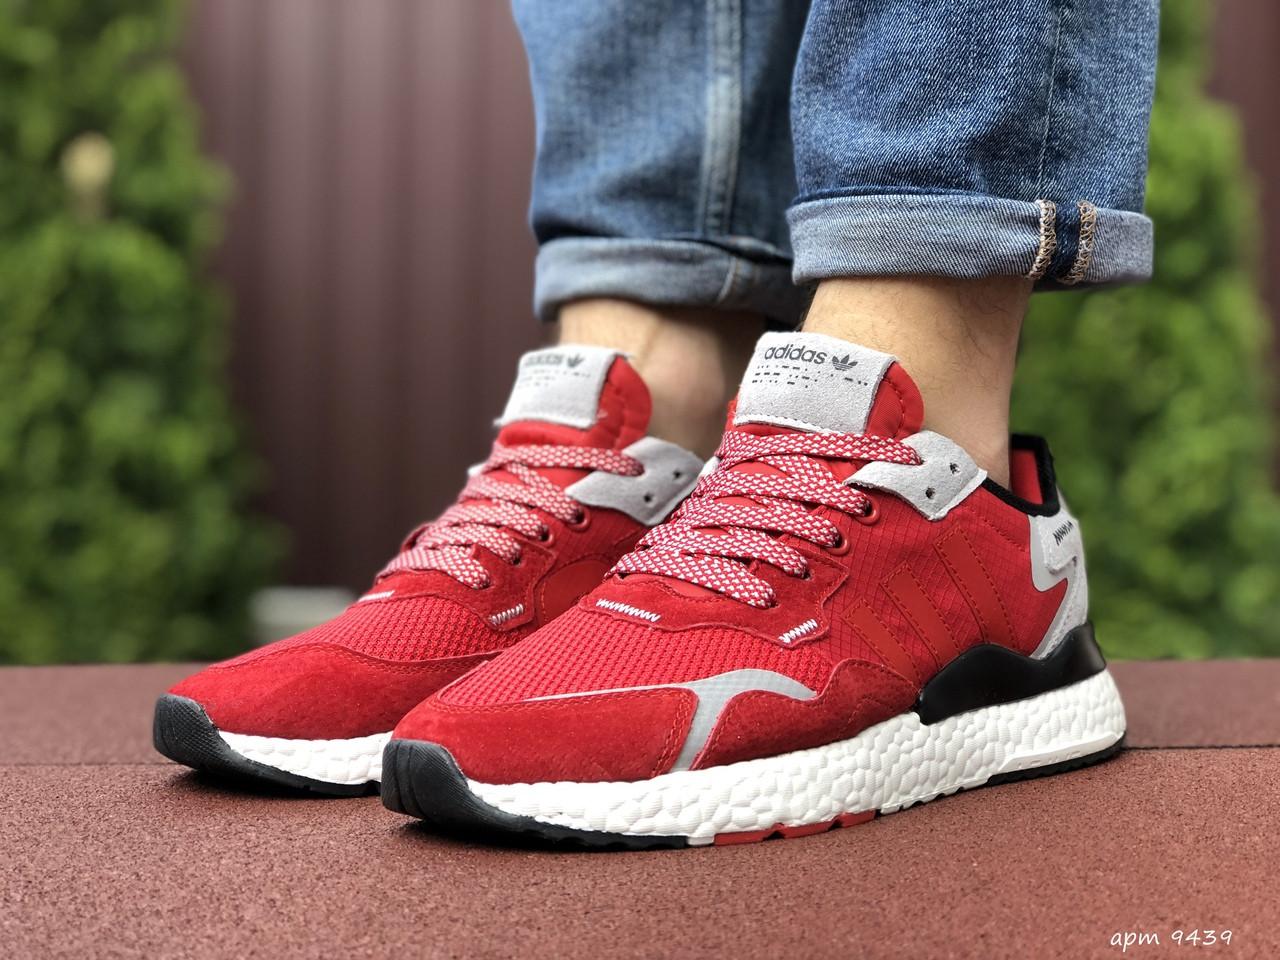 Кросівки чоловічі Adidas Nite Jogger Boost Адідас Джоггер, червоні / кросівки адідас (Топ репліка ААА+)